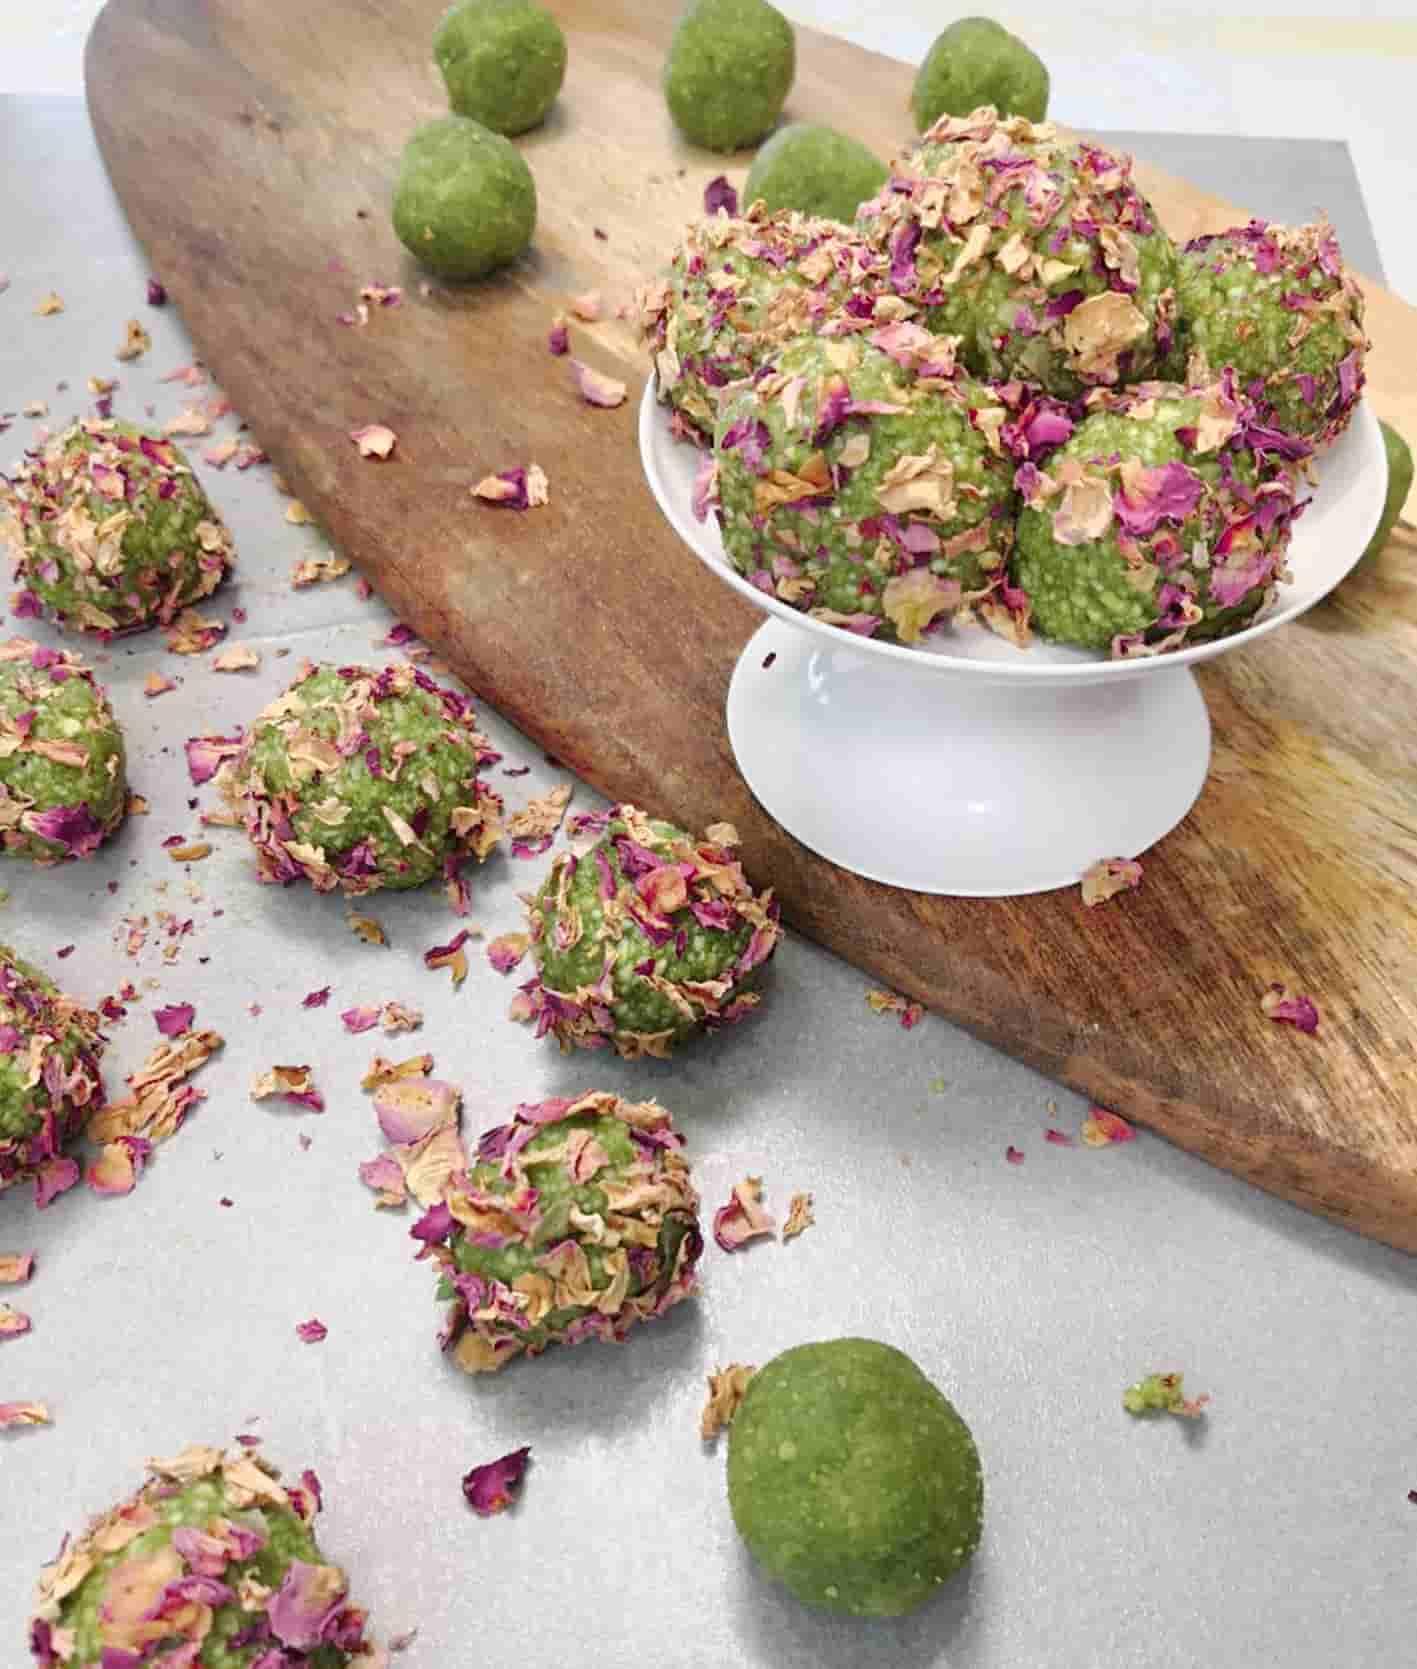 Amygdalota-almond-truffles-matcha-rose-petals-1-recipe-dessert